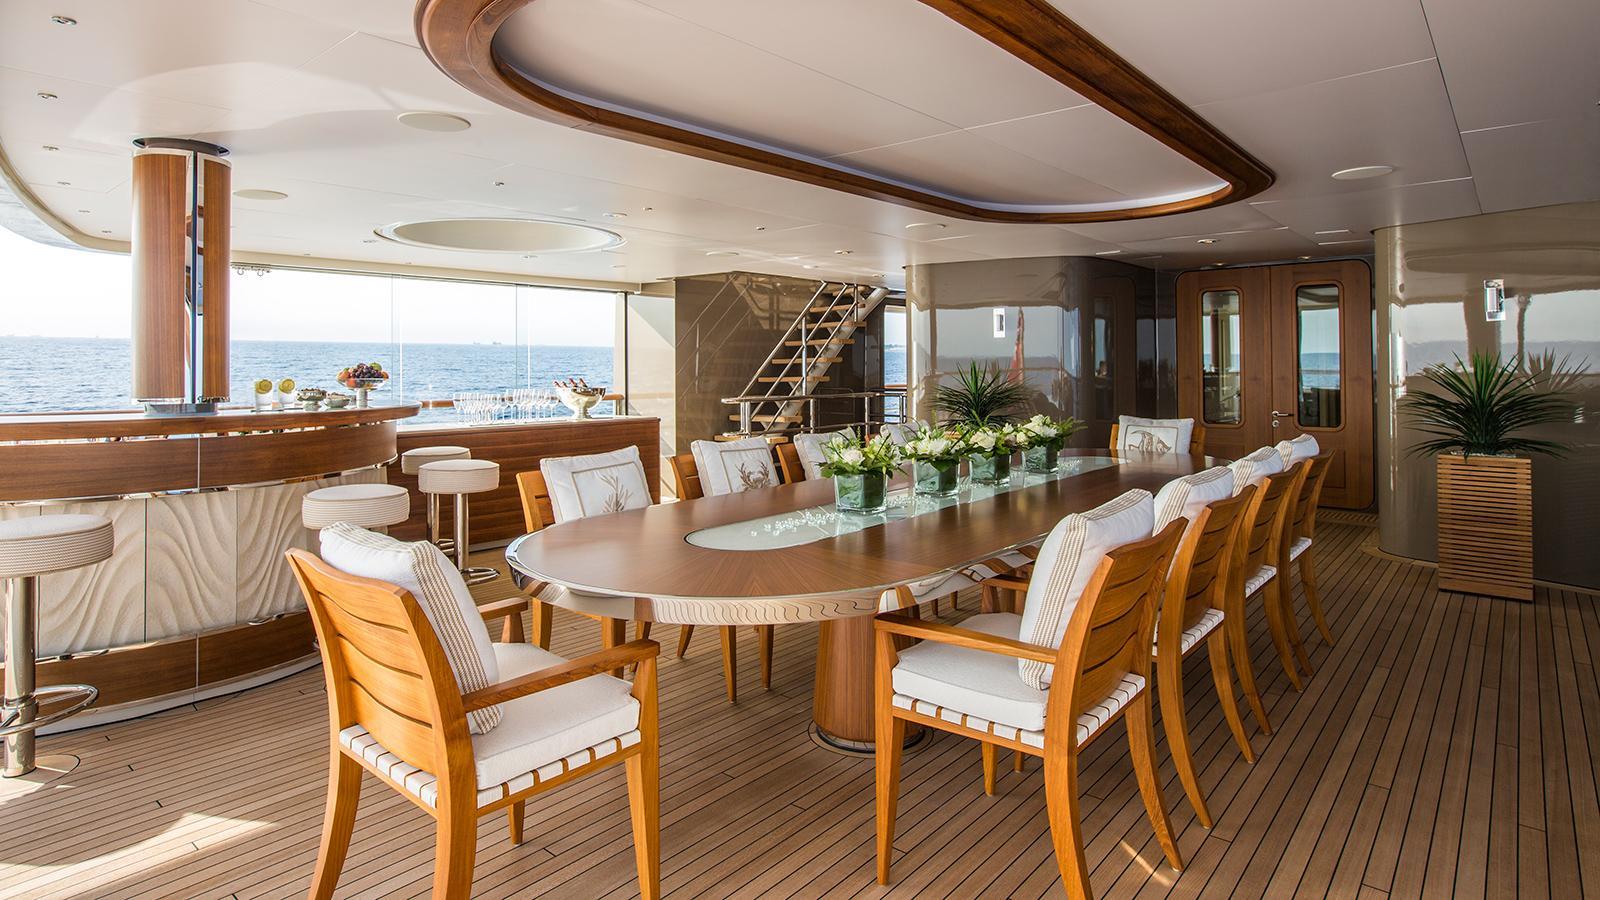 polar star explorer yacht lurssen 2005 65m aft deck dining